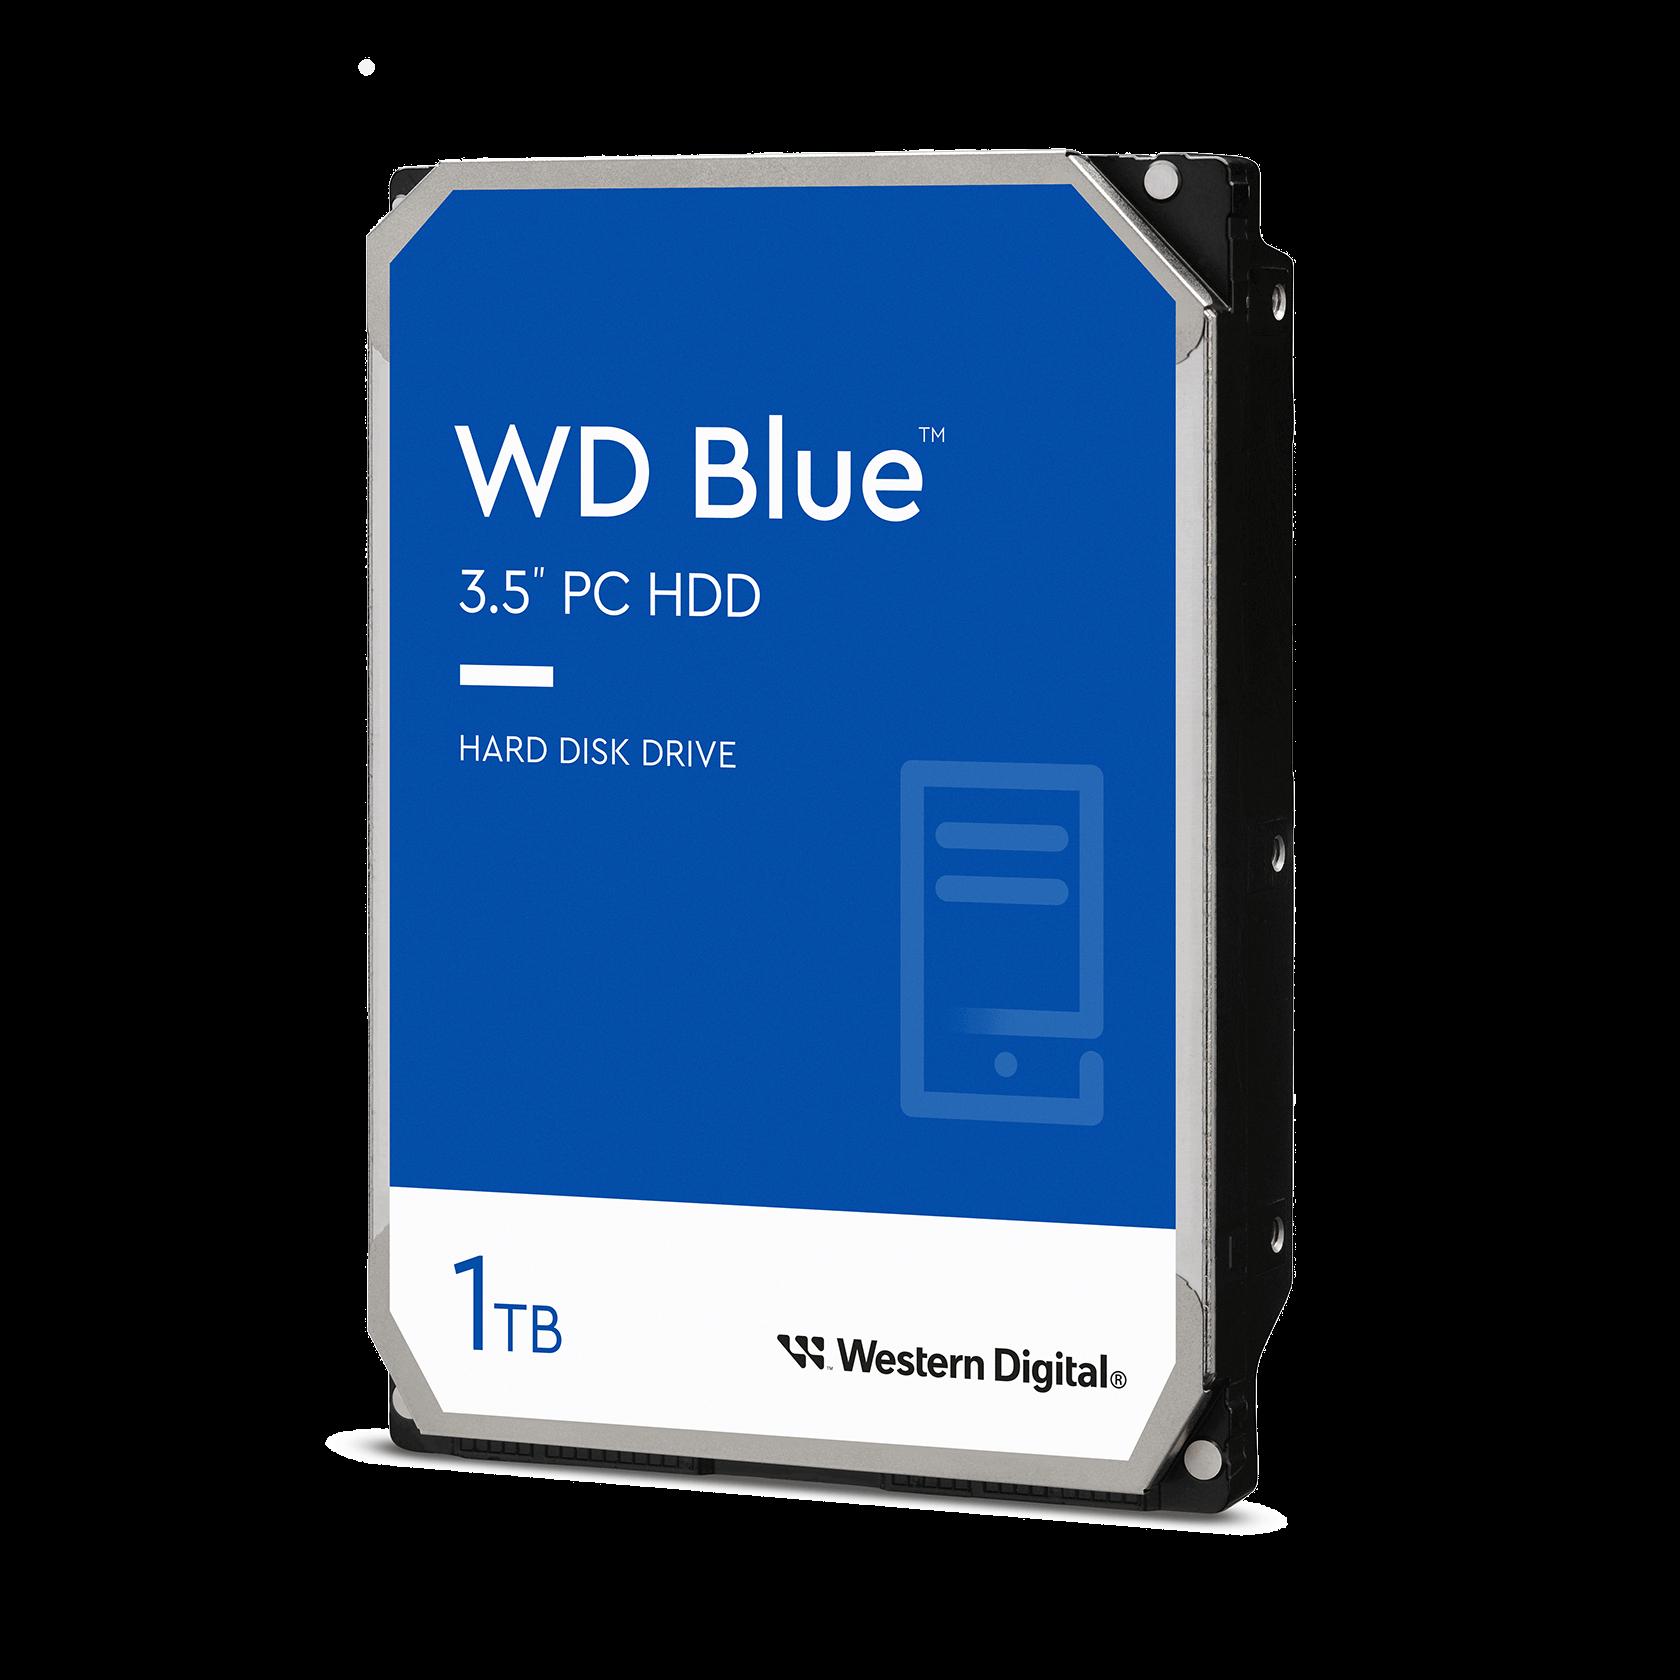 Western Digital 1TB WD 3.5 PC, Blue - WD10EZRZ > SSD ...